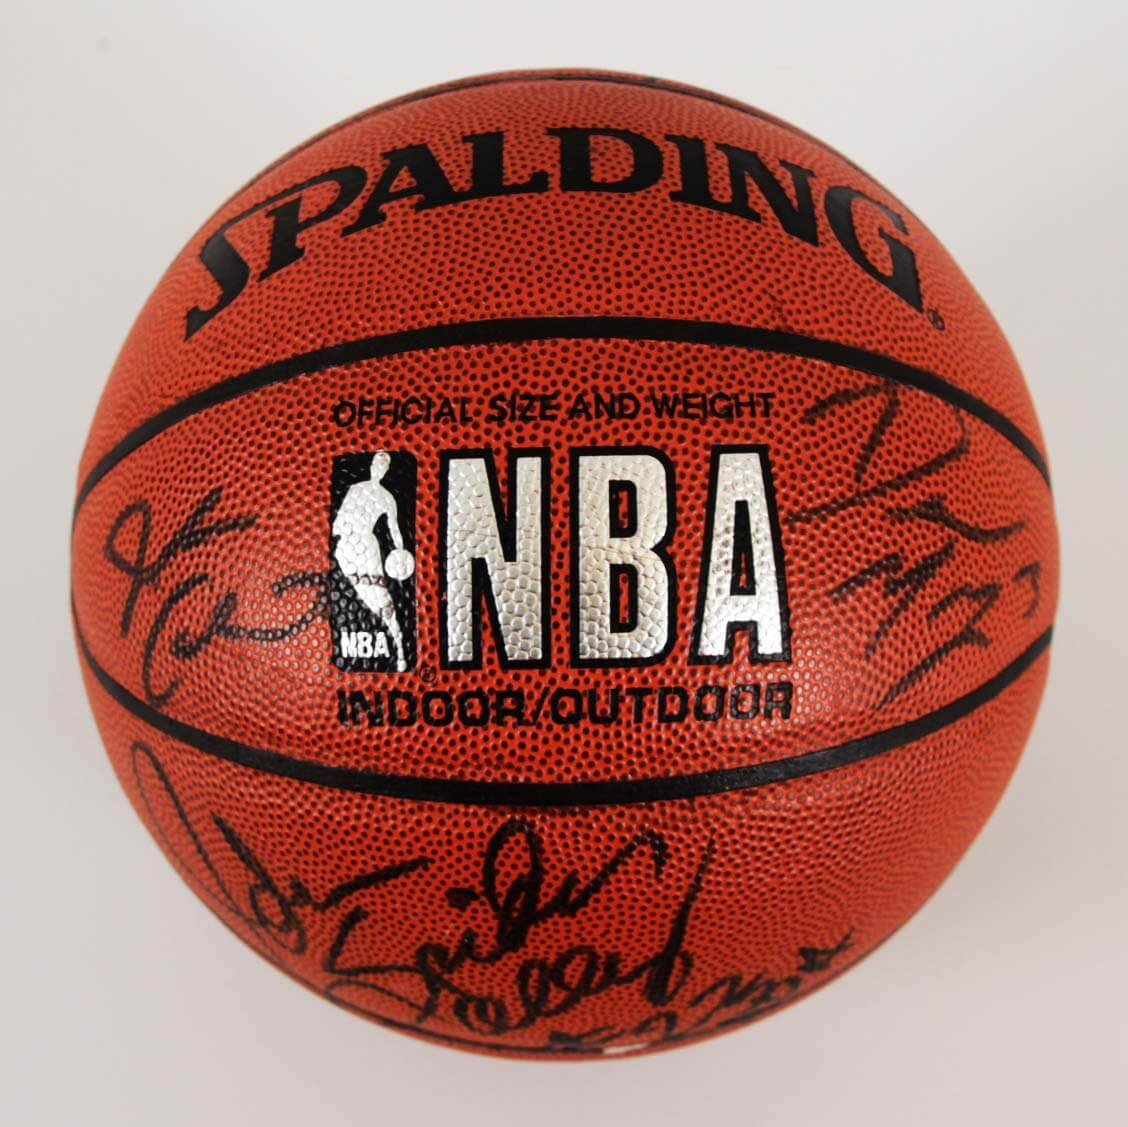 41ac6a93 1999-00 Los Angeles Lakers Multi-Signed Basketball – Kobe Bryant etc. – JSA